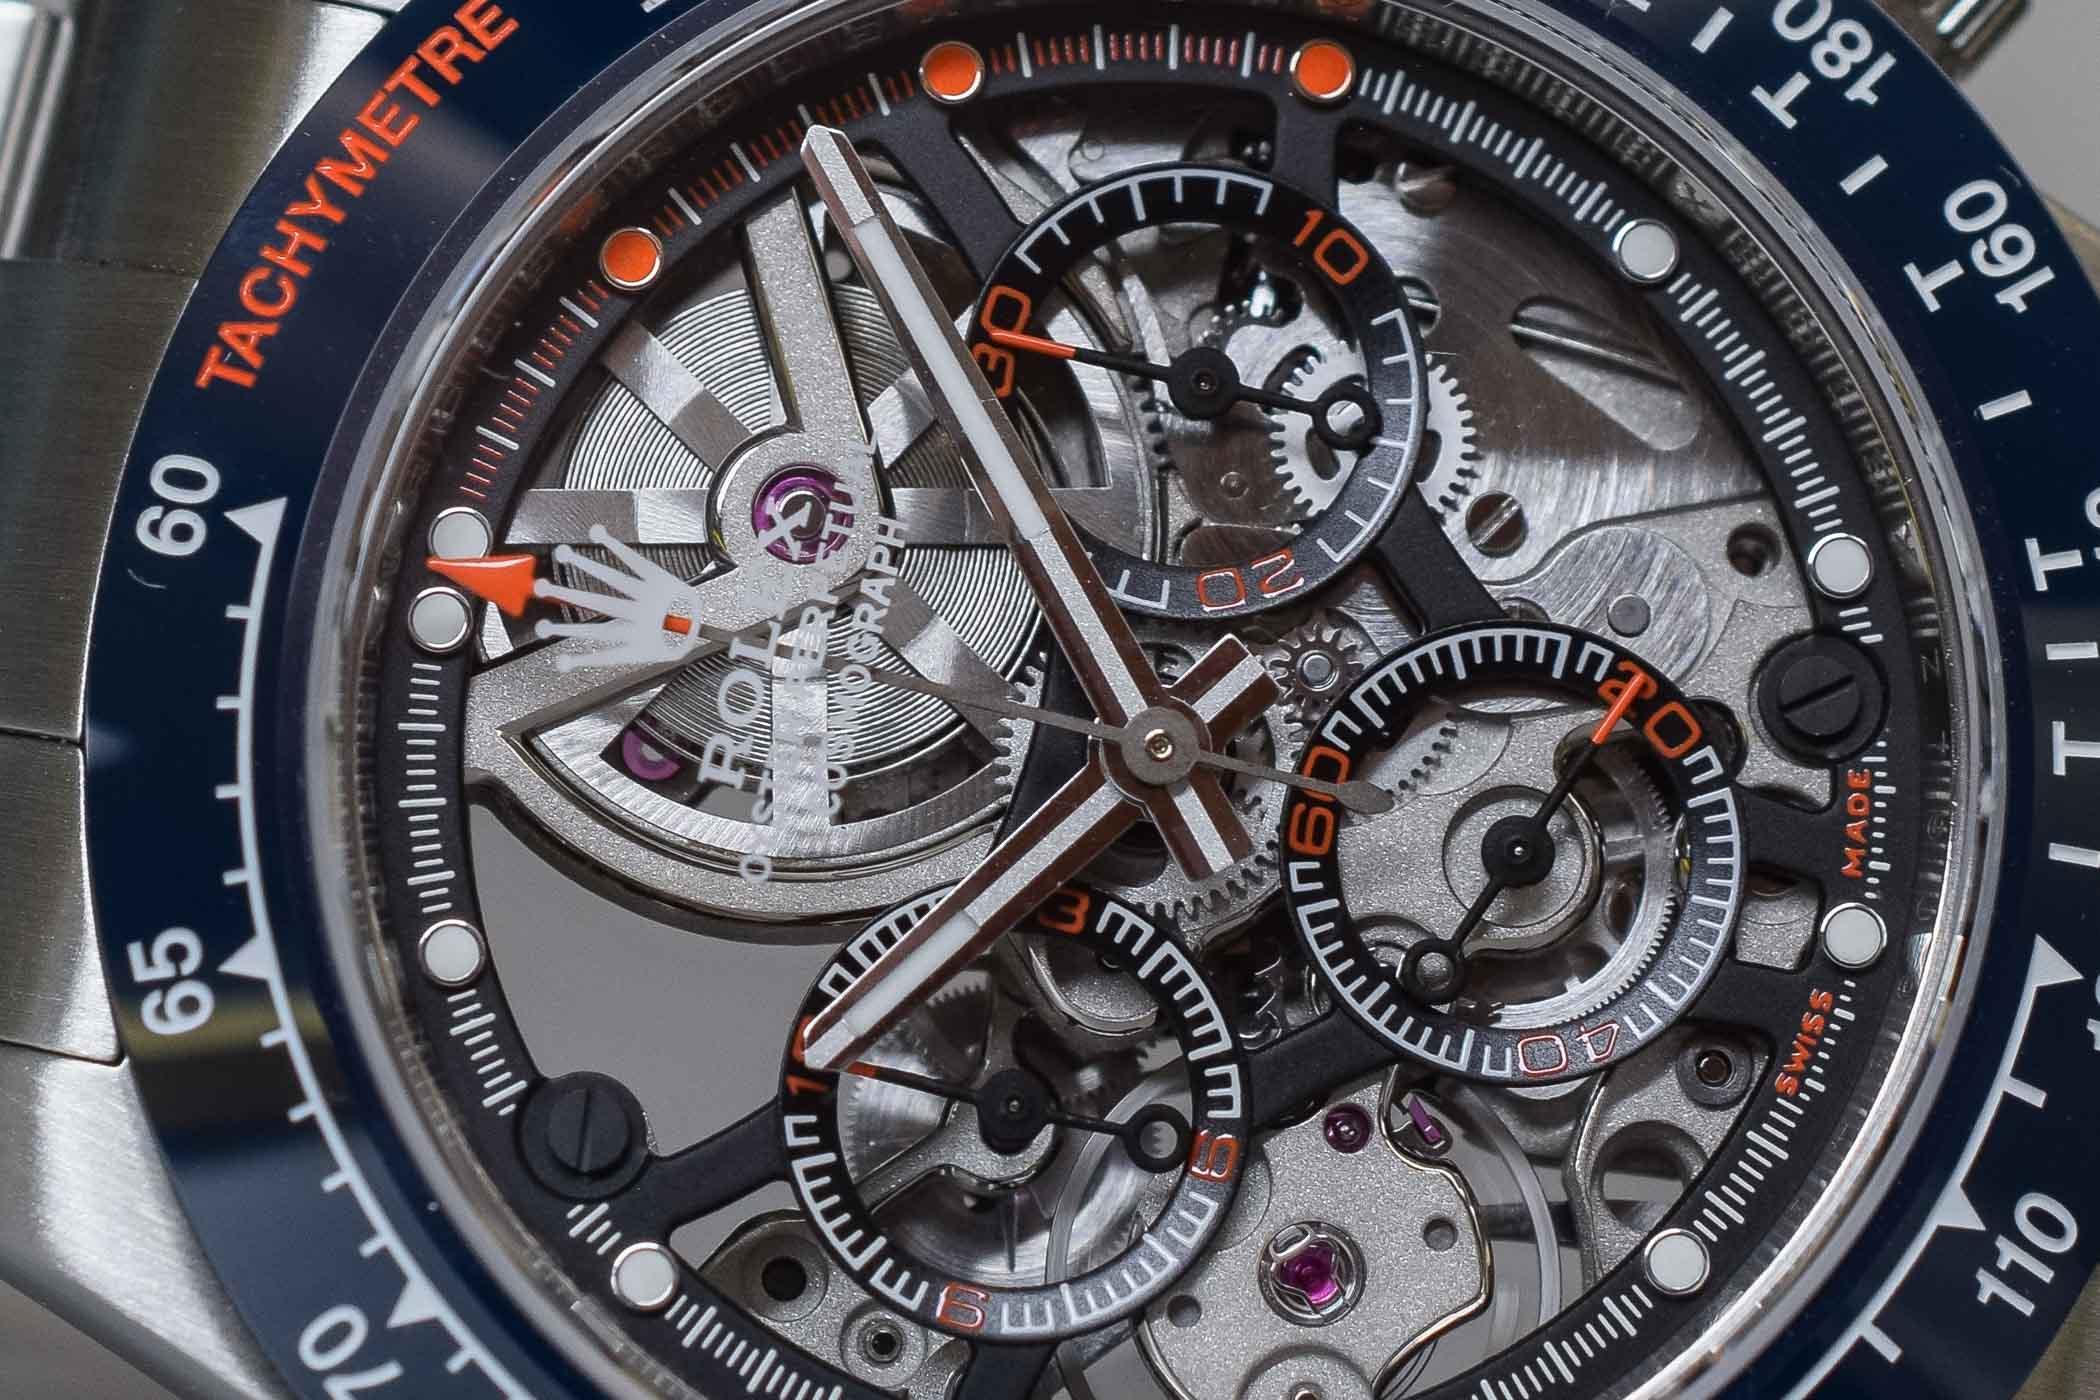 Artisans de Geneve La Blausee - Skeletonized and Hand-Wound Rolex Daytona 116520